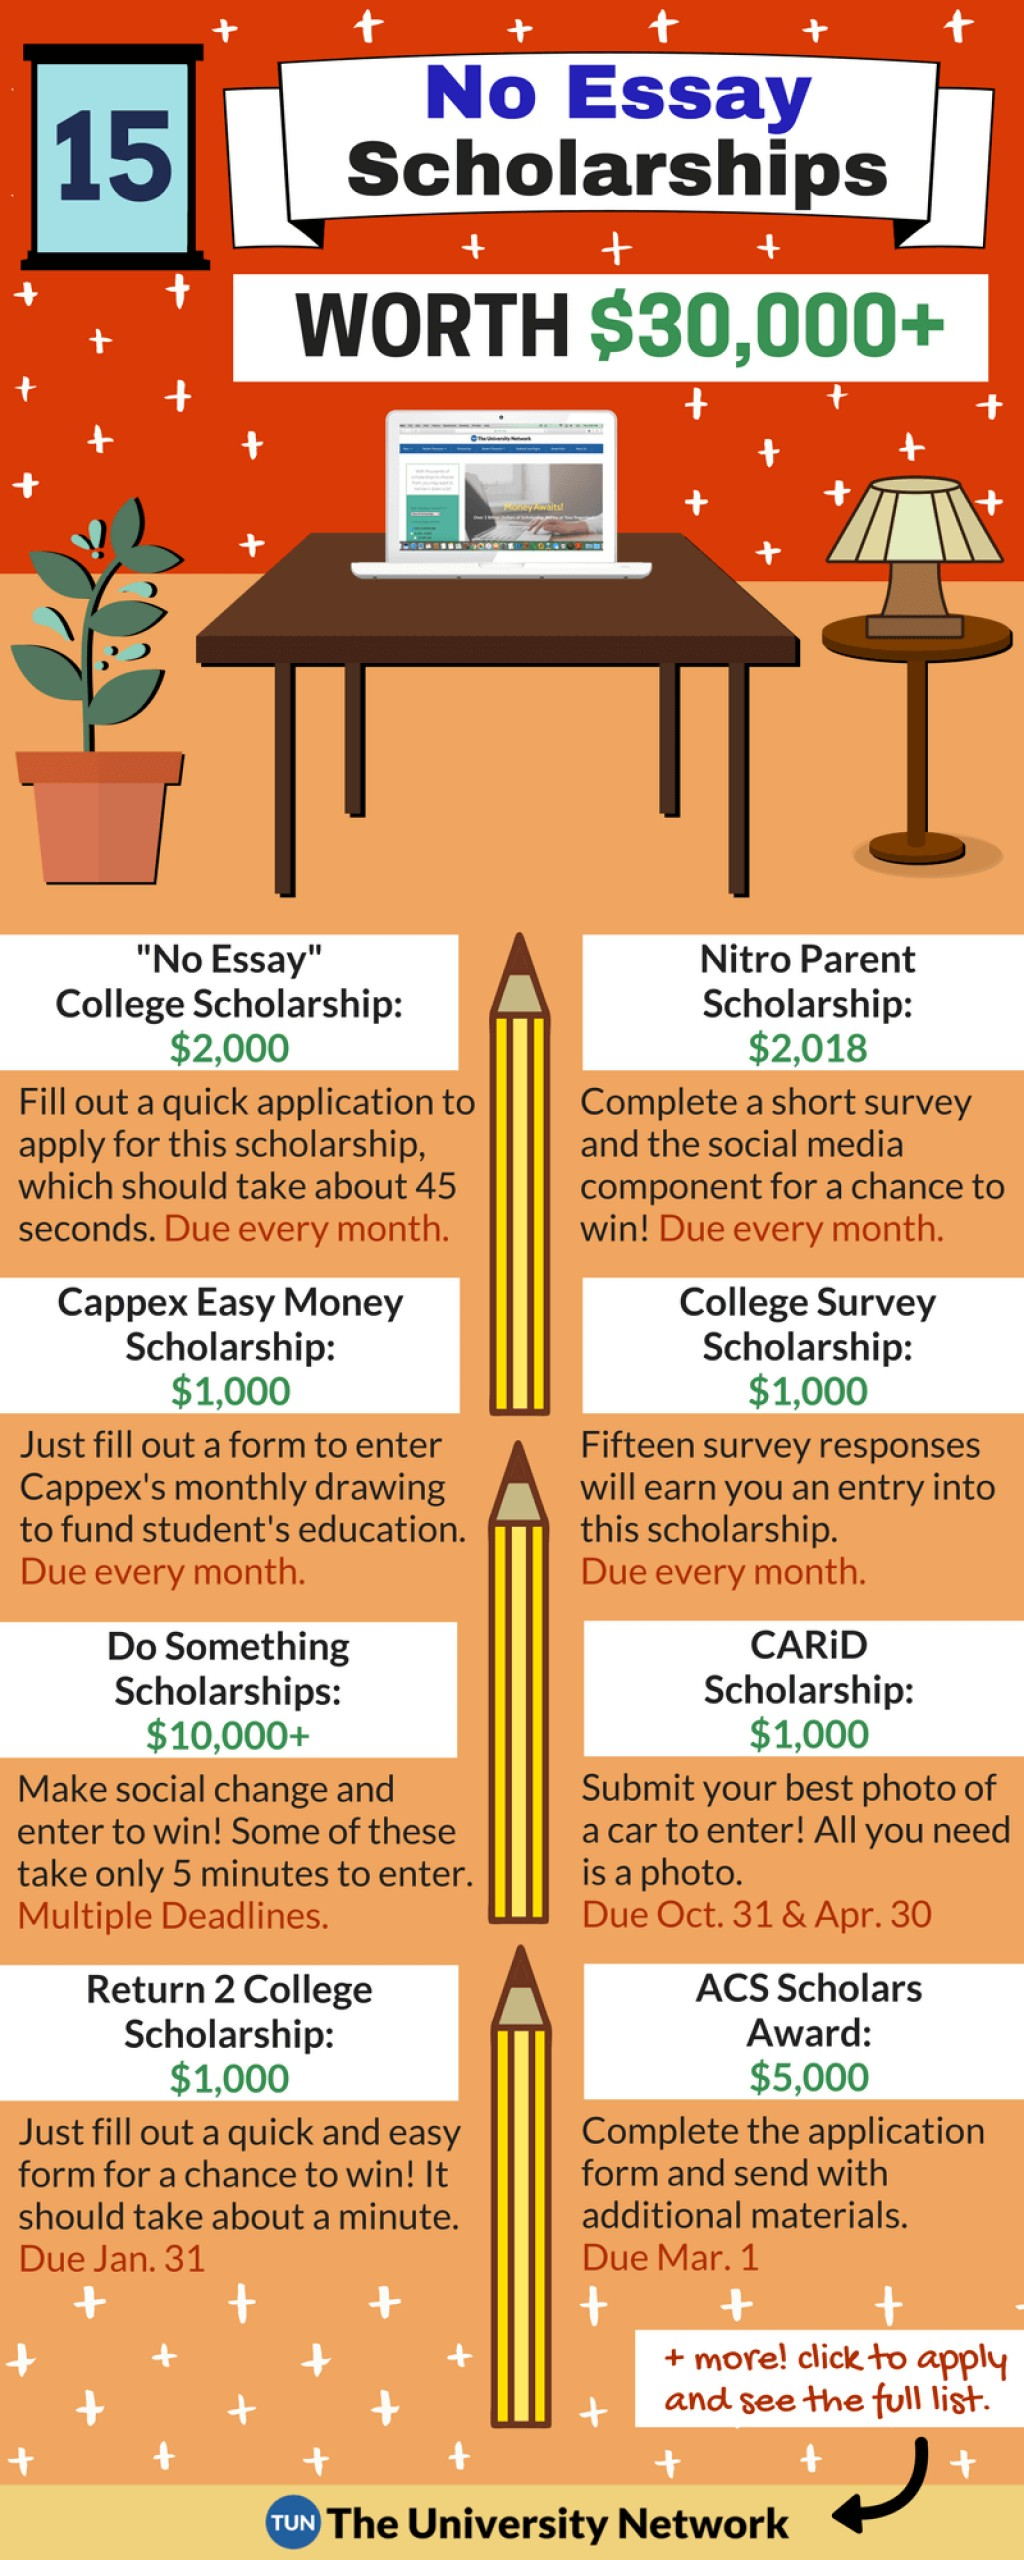 006 Easy No Essay Scholarships Striking 2015 2019 Large